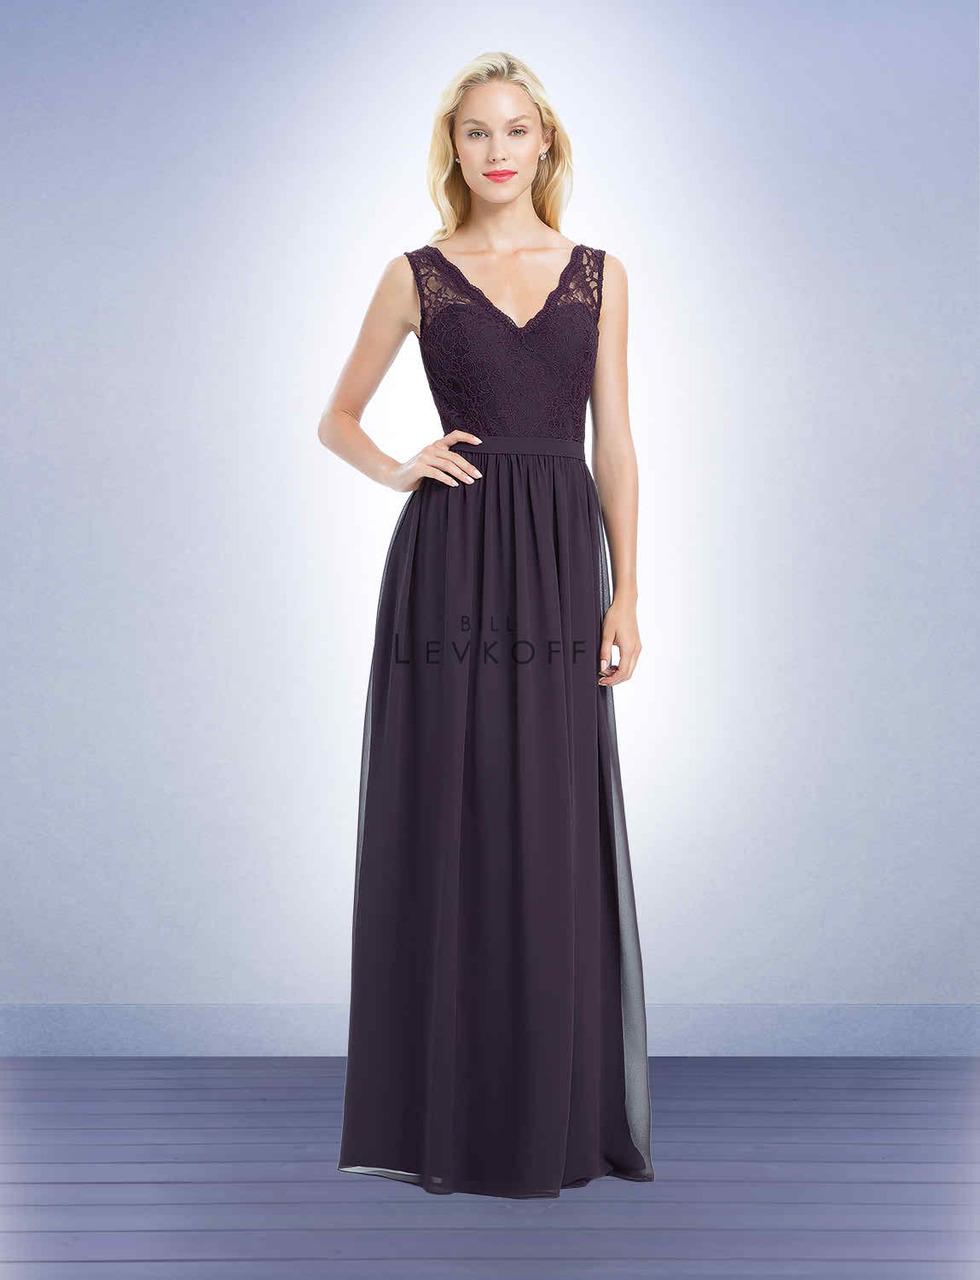 bf35ebcea47 Bridesmaid Dresses By Bill Levkoff - Gomes Weine AG